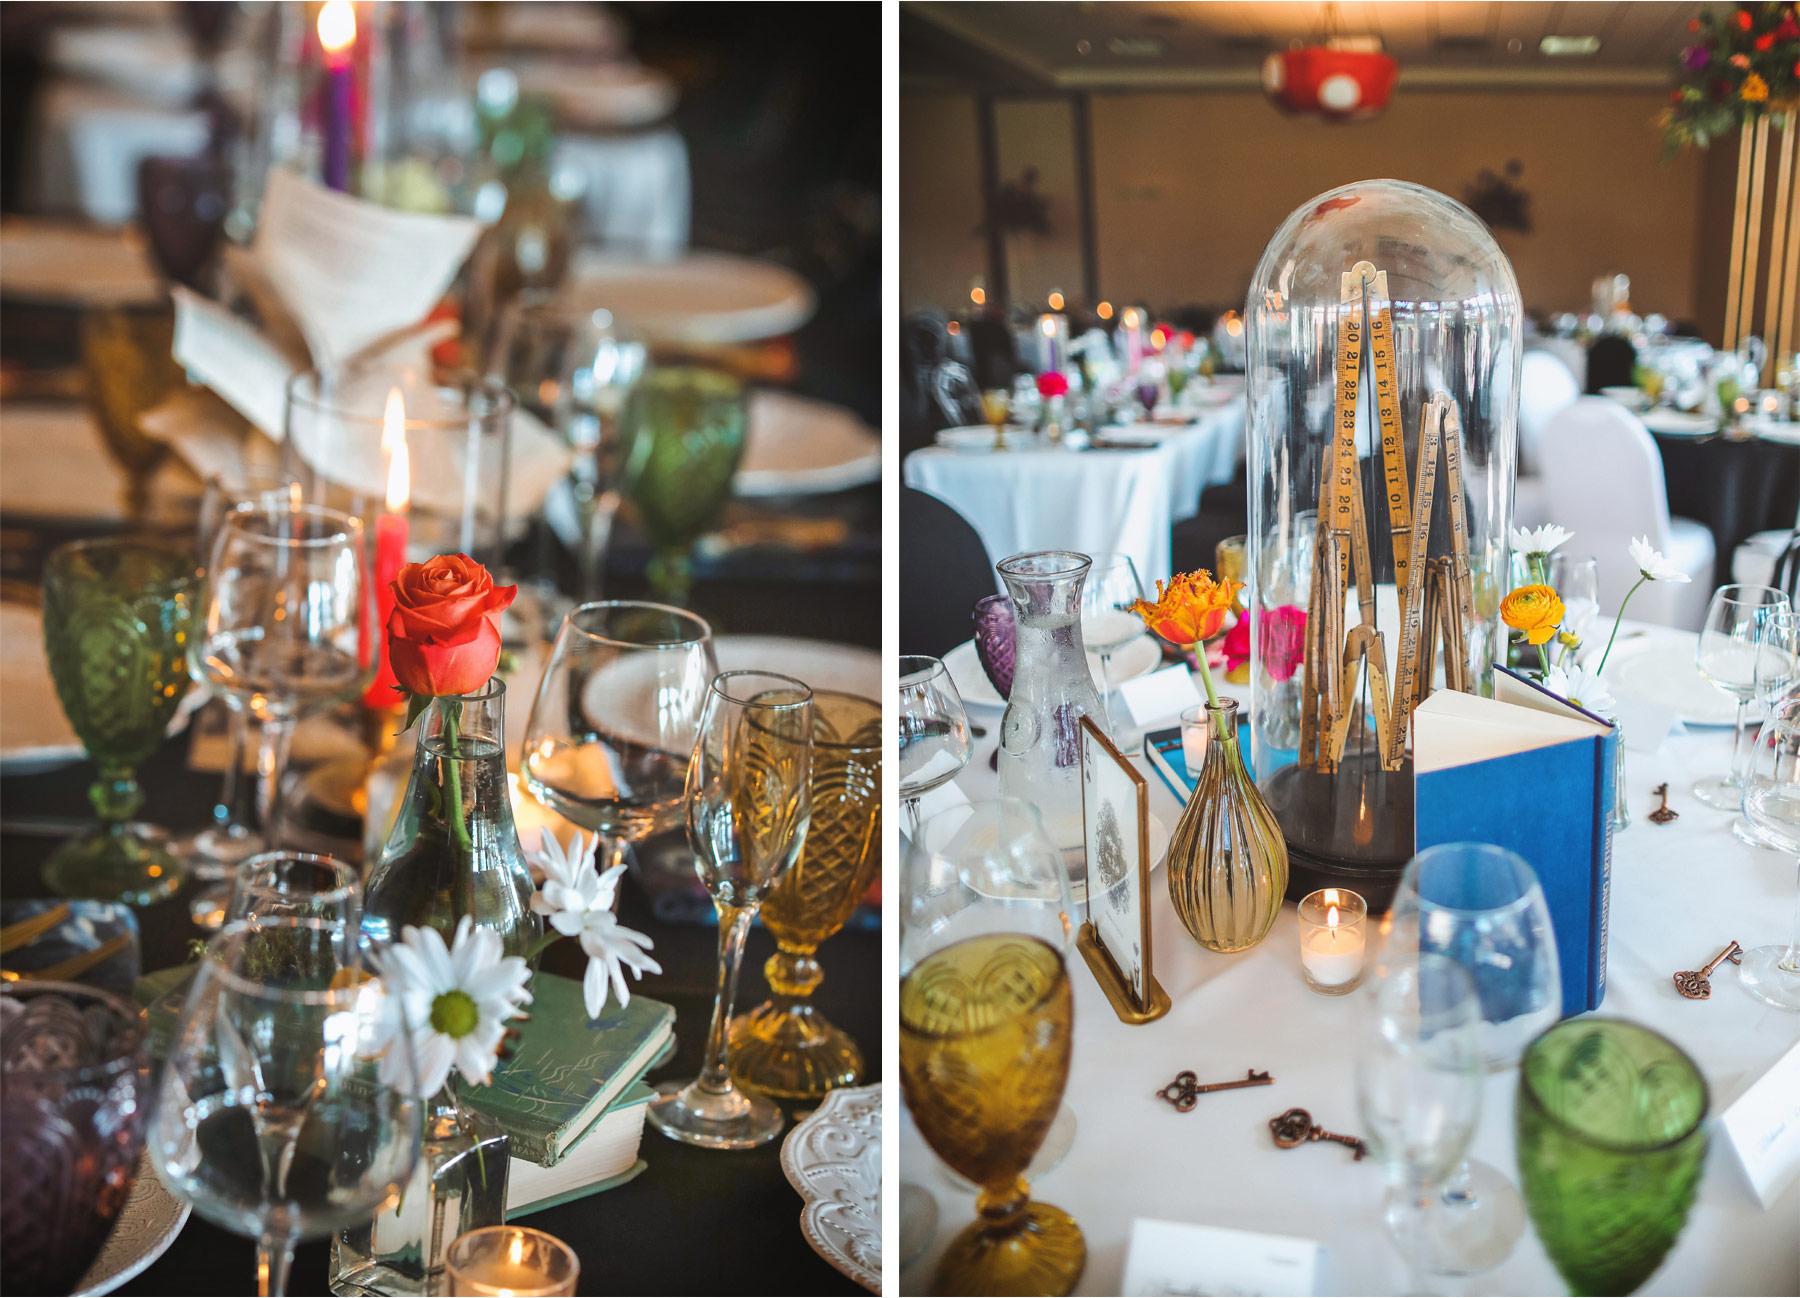 19-Vick-Photography-Wedding-Ottertail-Minnesota-Alice-in-Wonderland-Theme-Reception-Table-Decor-Mushrooms-Tess-and-Greg.jpg